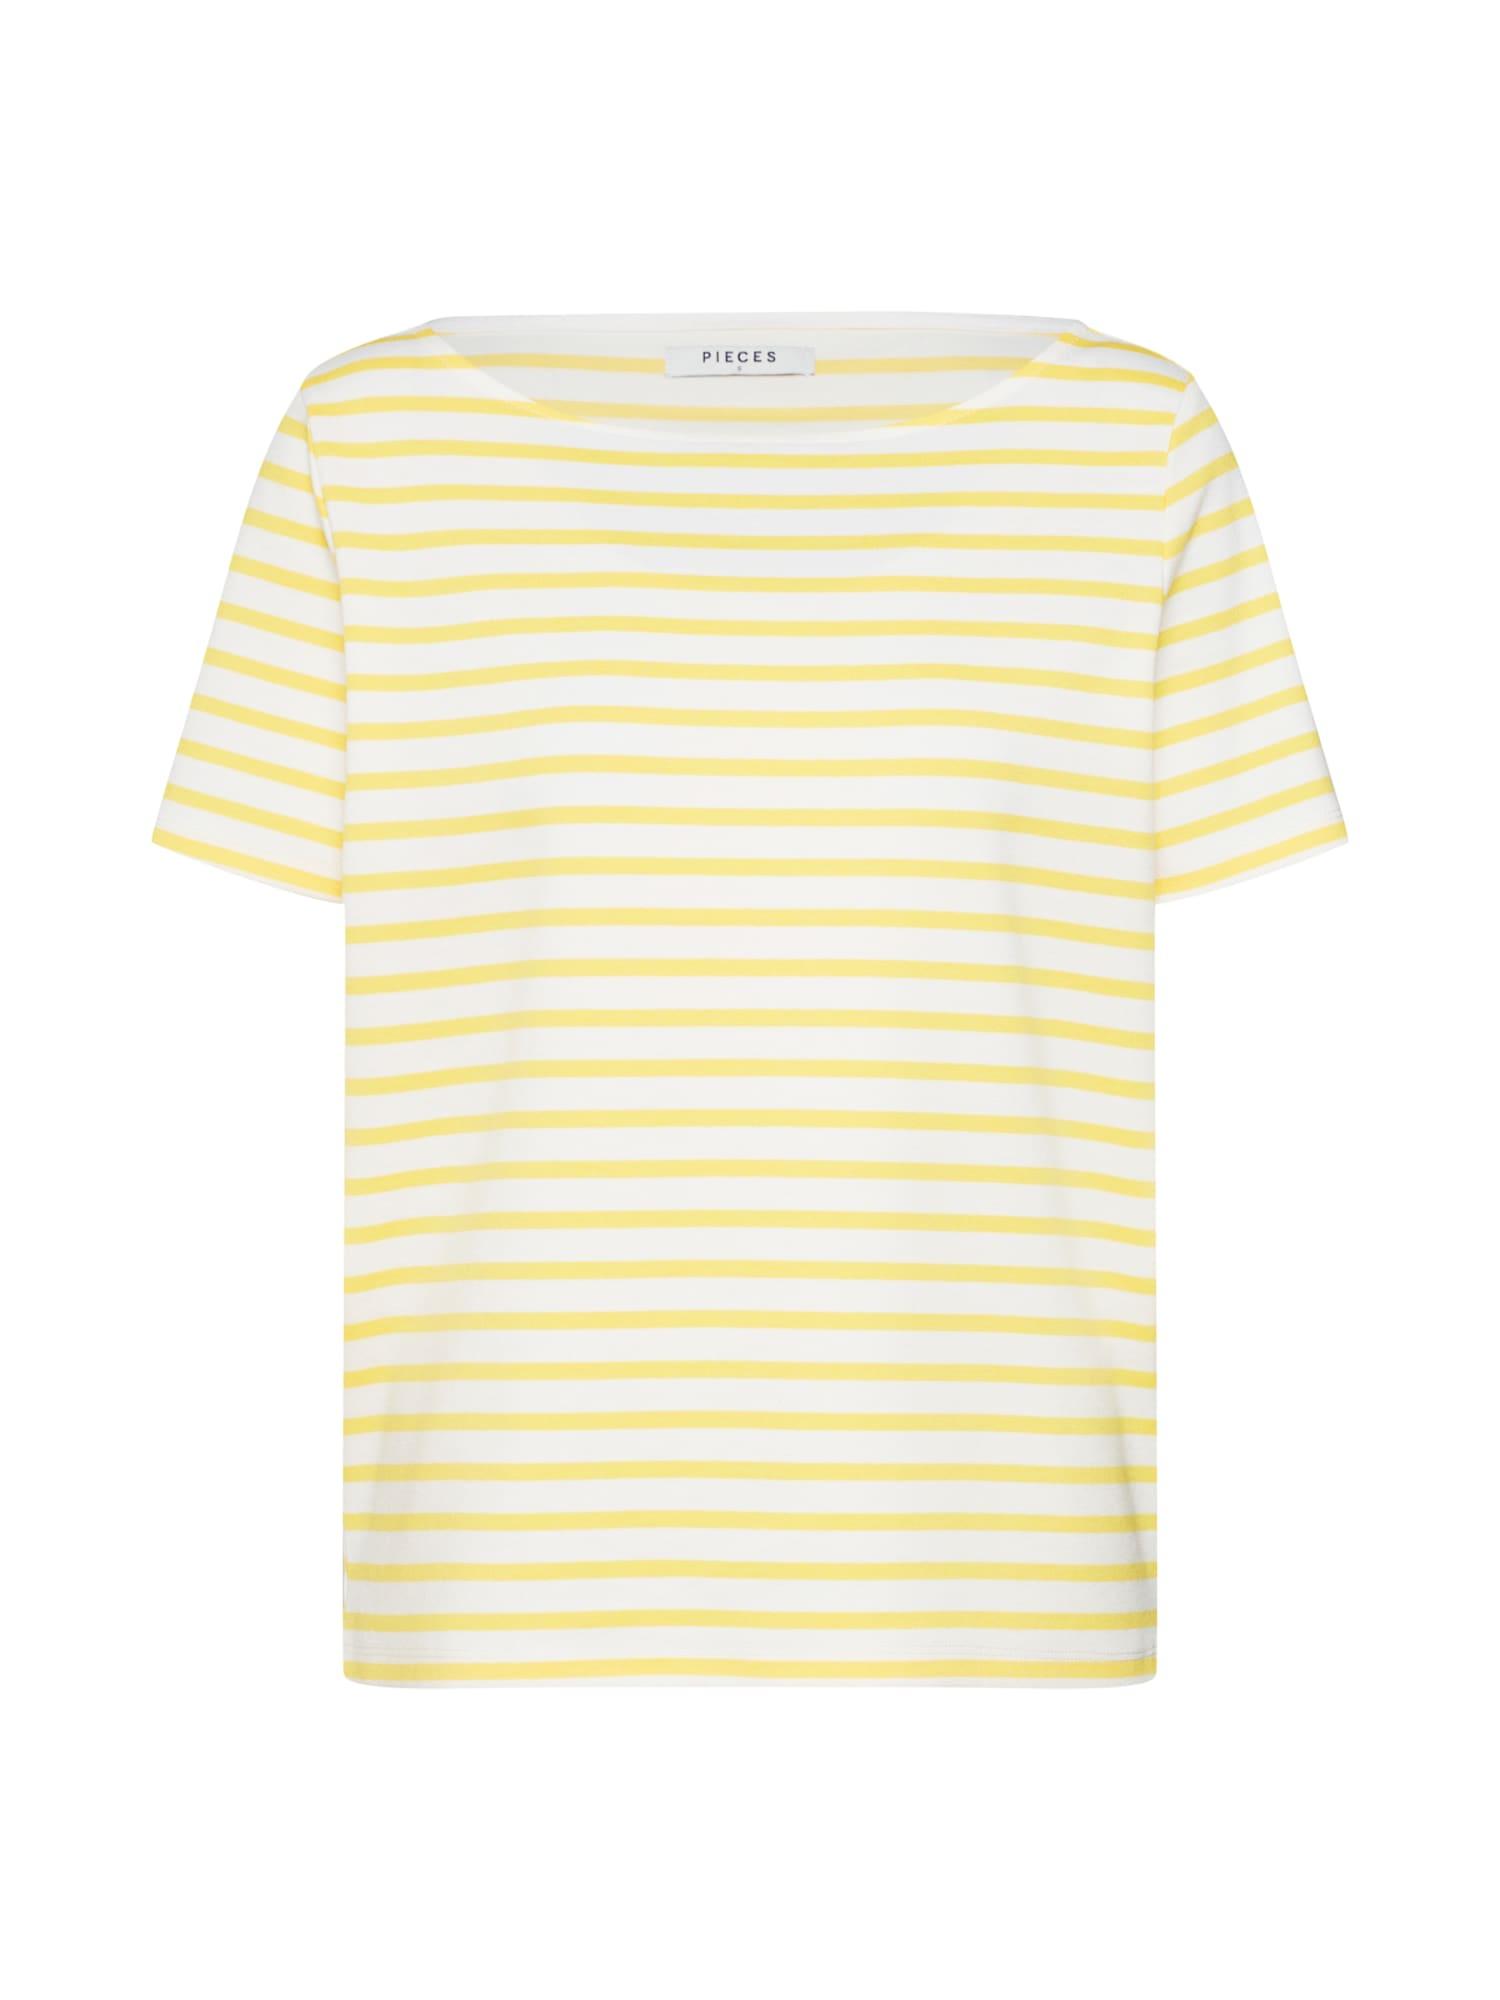 Tričko Ingrid žlutá bílá PIECES